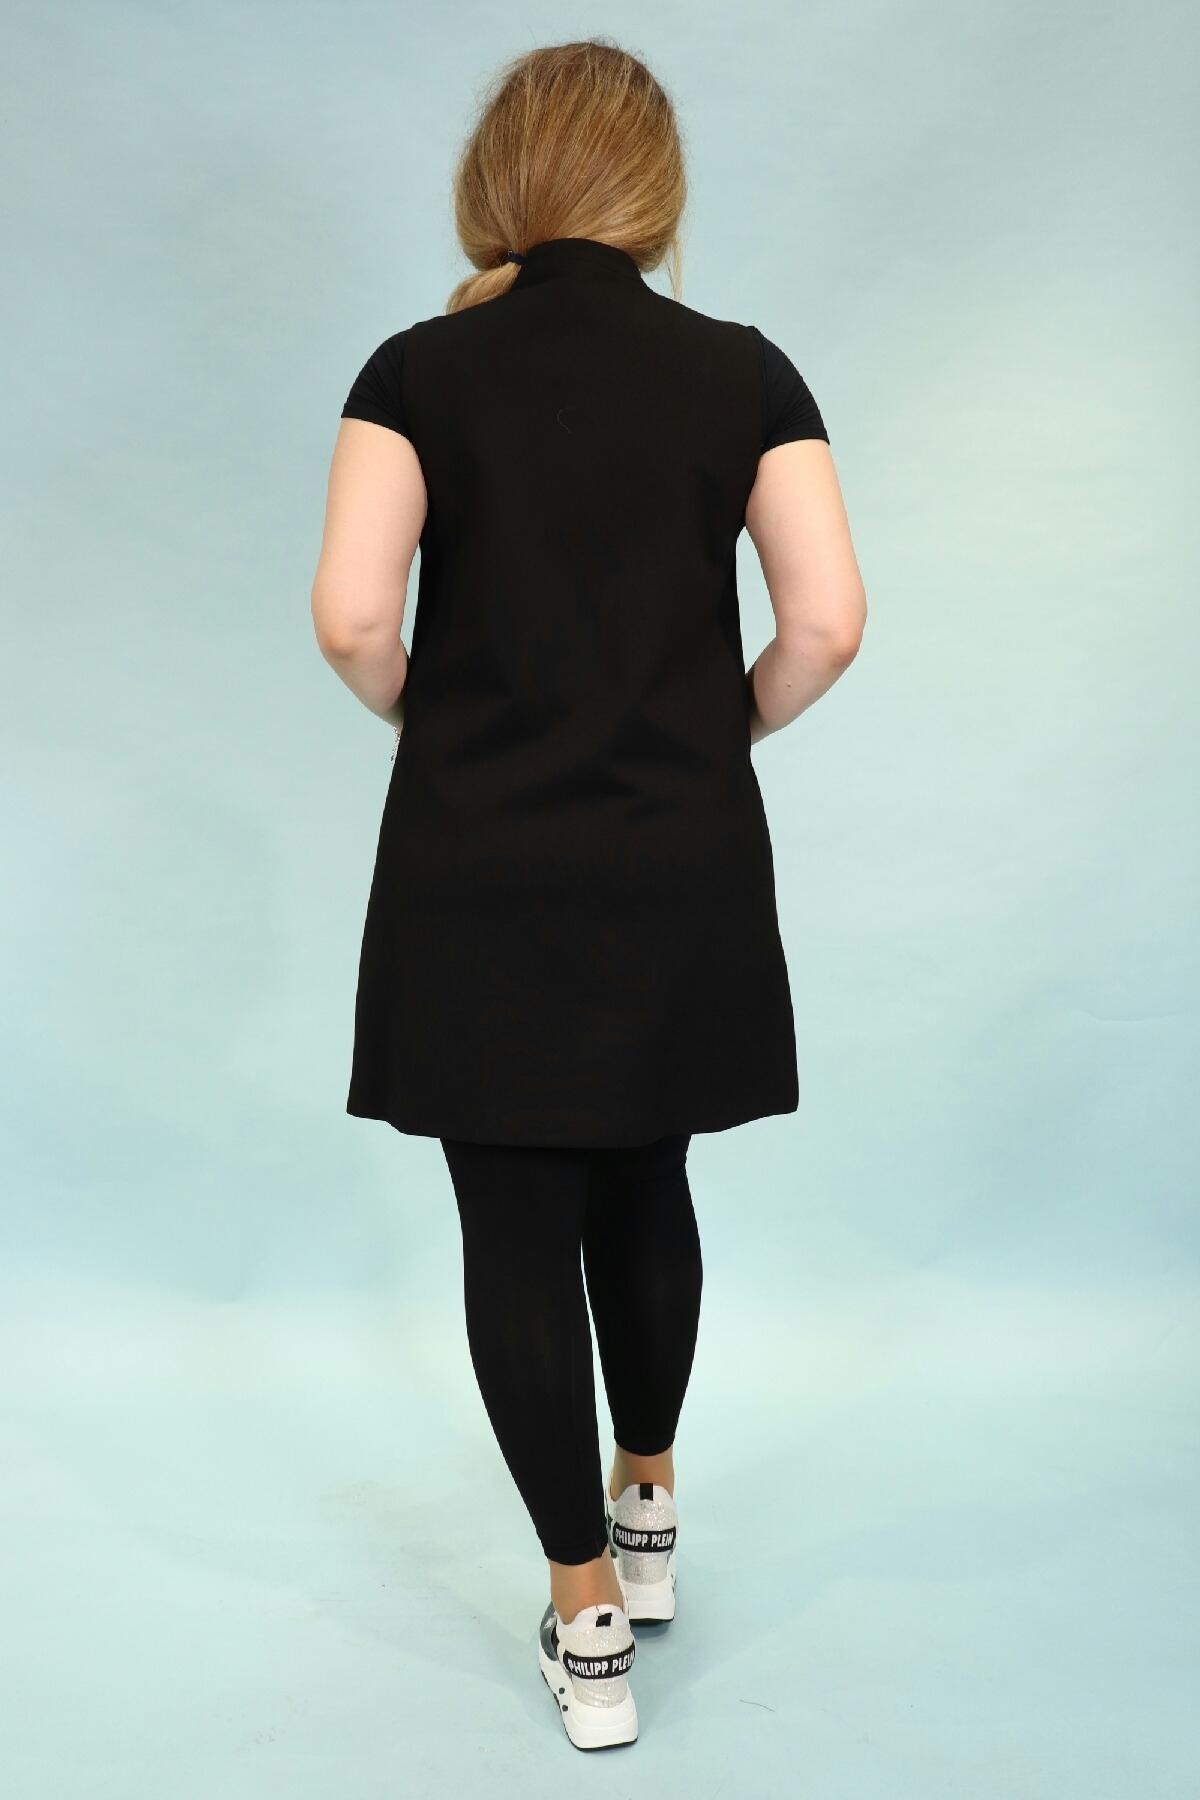 SveltoStella   STELLA sv-stl9050-02 - Women, Clothes, Vests